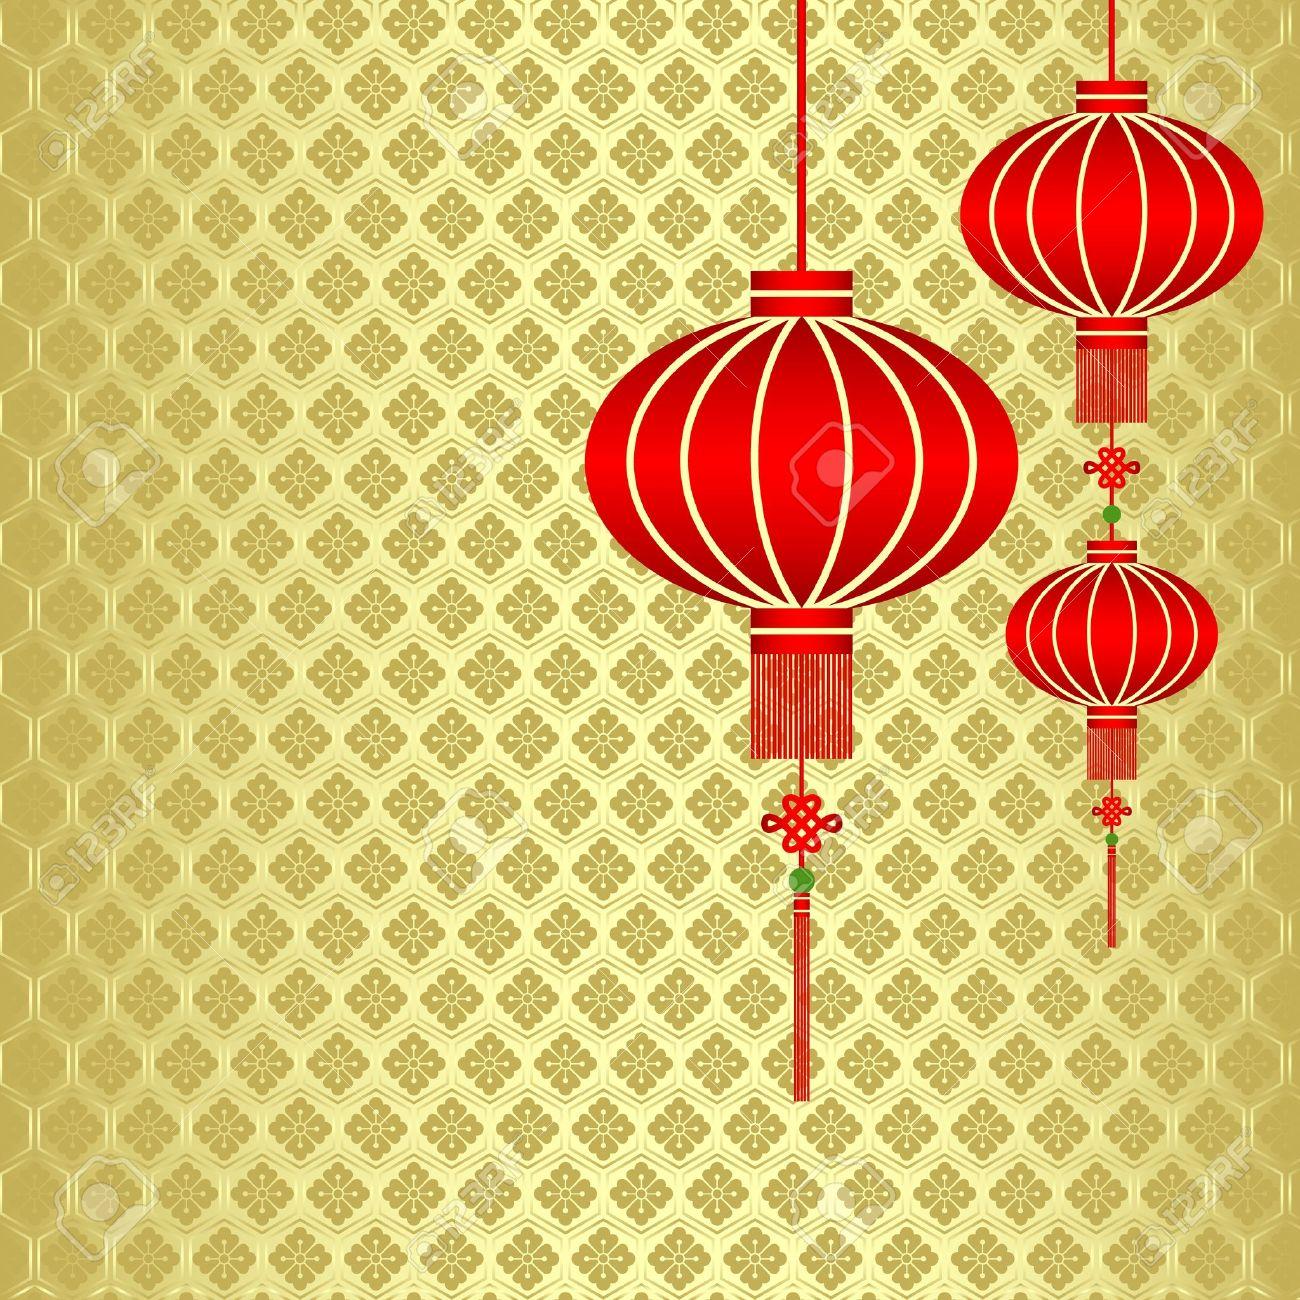 red chinese lantern on seamless pattern background royalty free